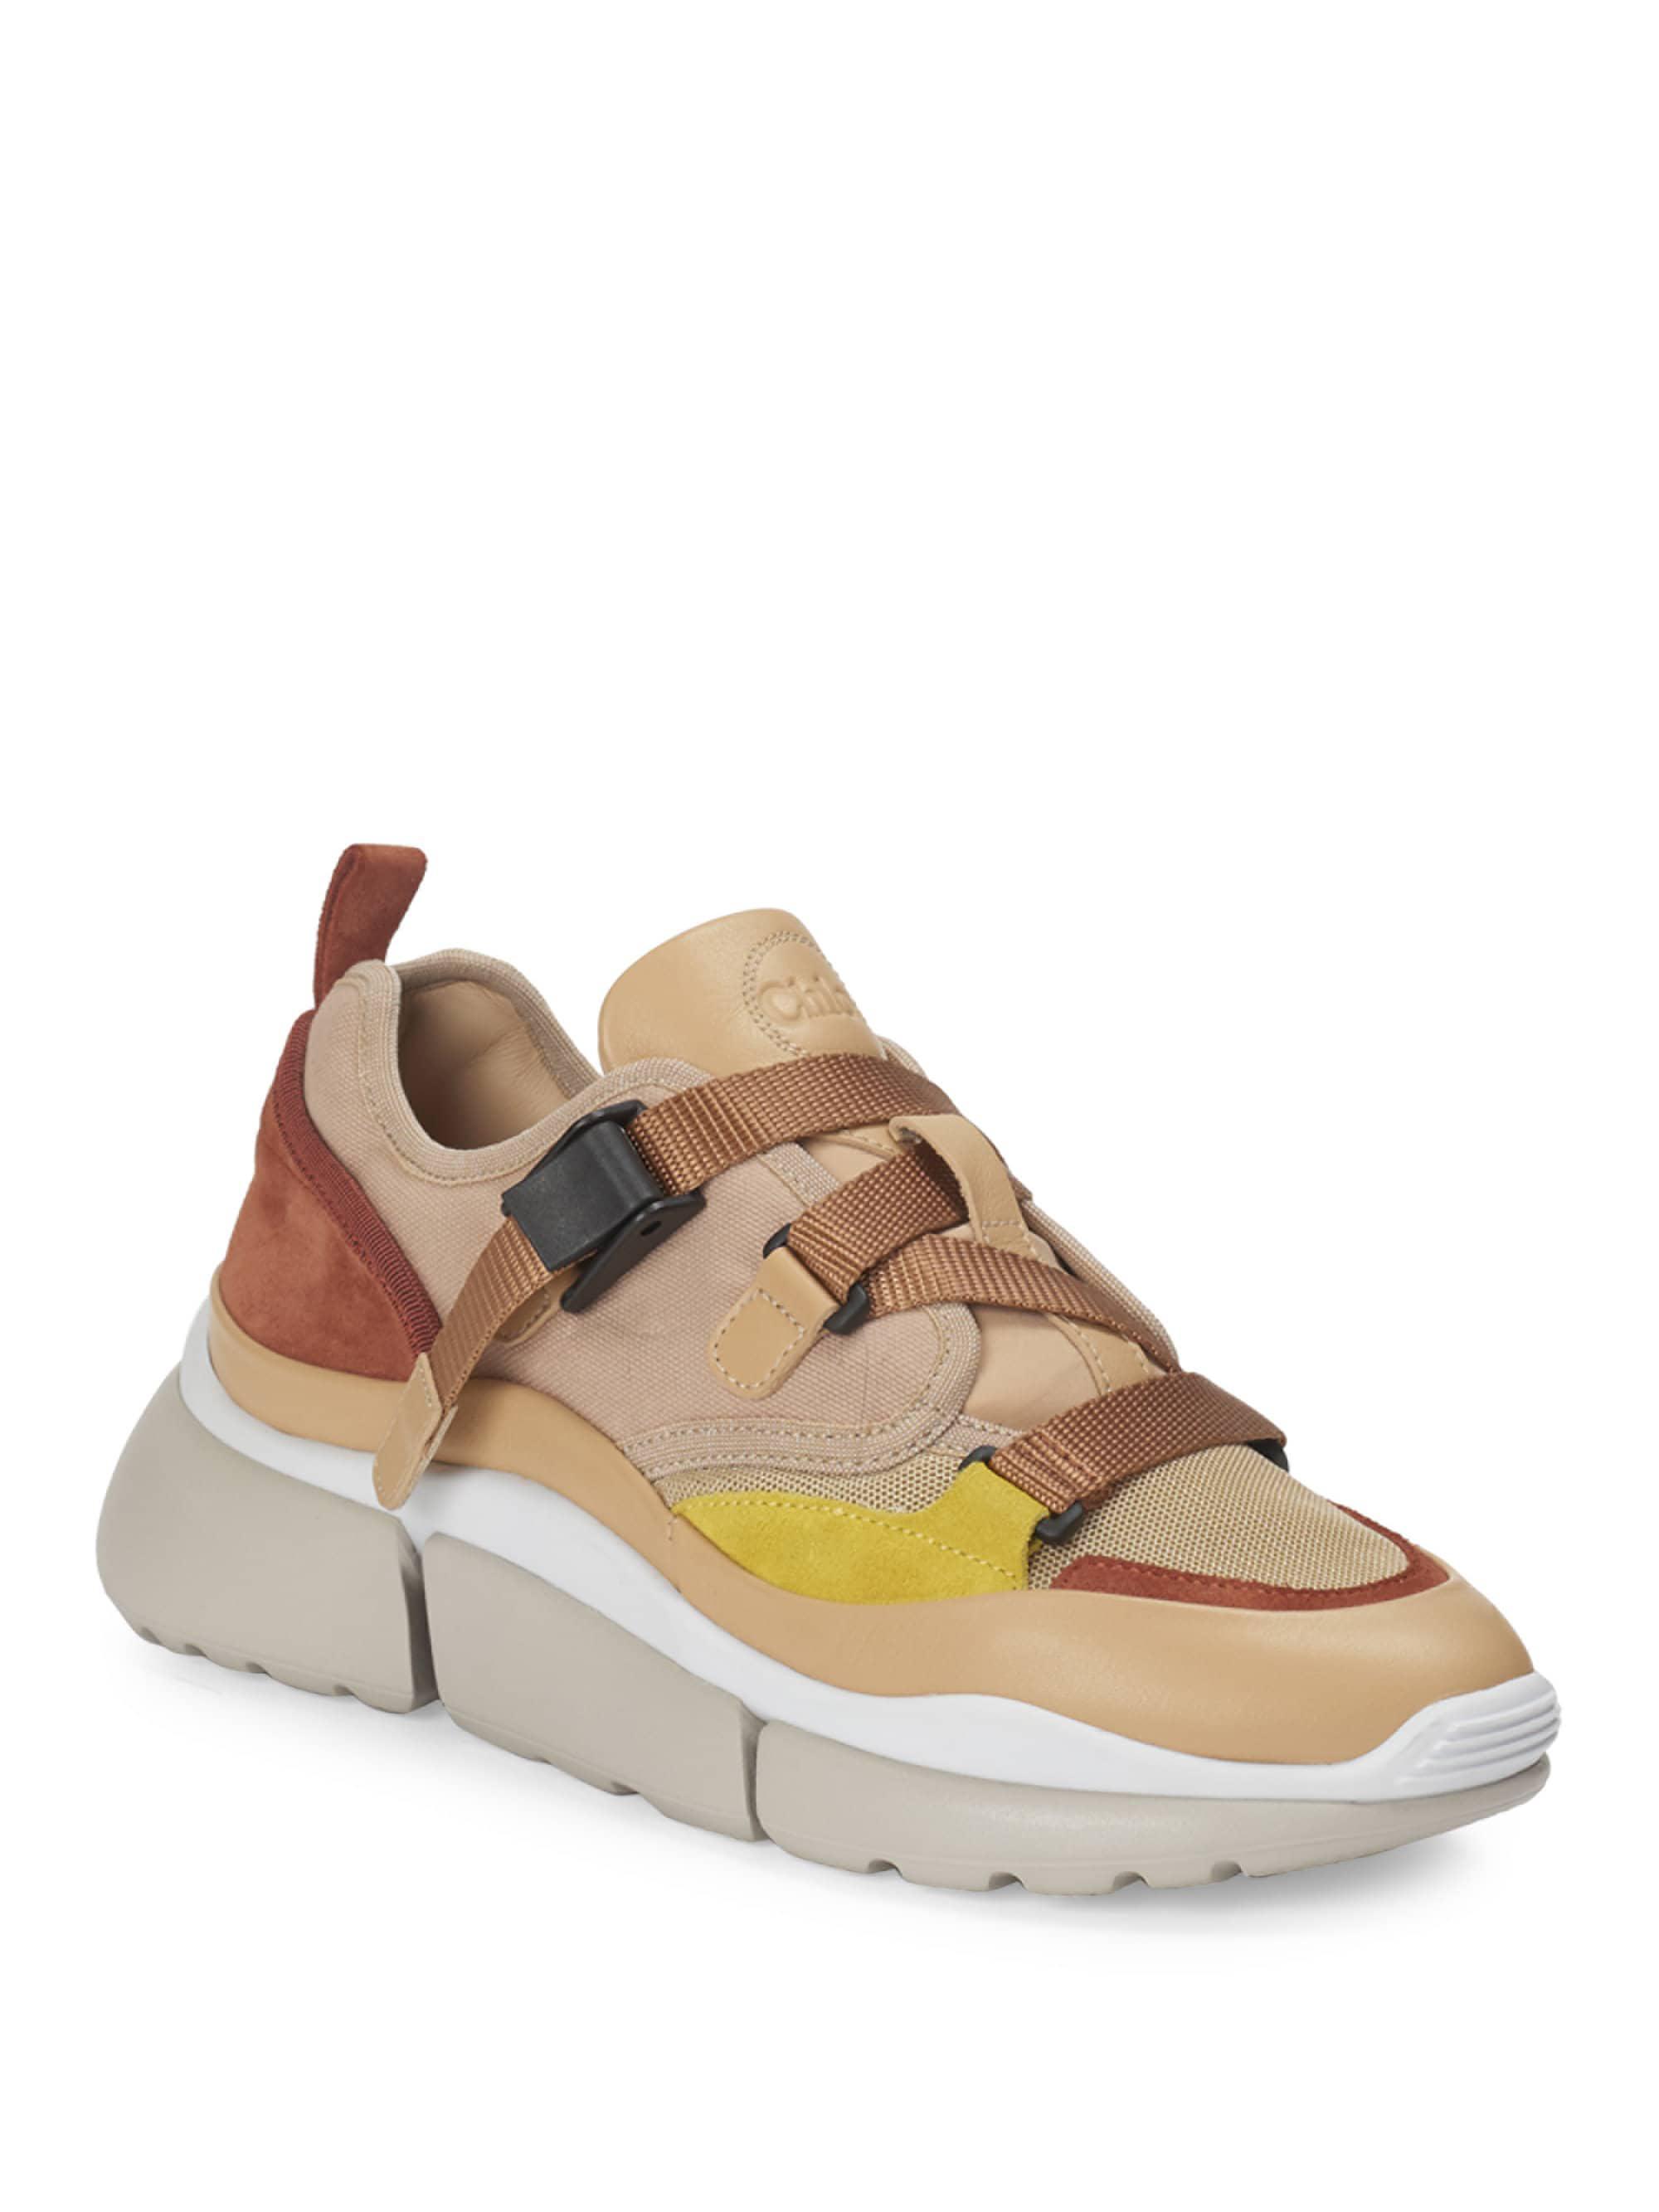 Chloé Sonnie Strappy Textile Chunky Sneakers DjgqERI8WT